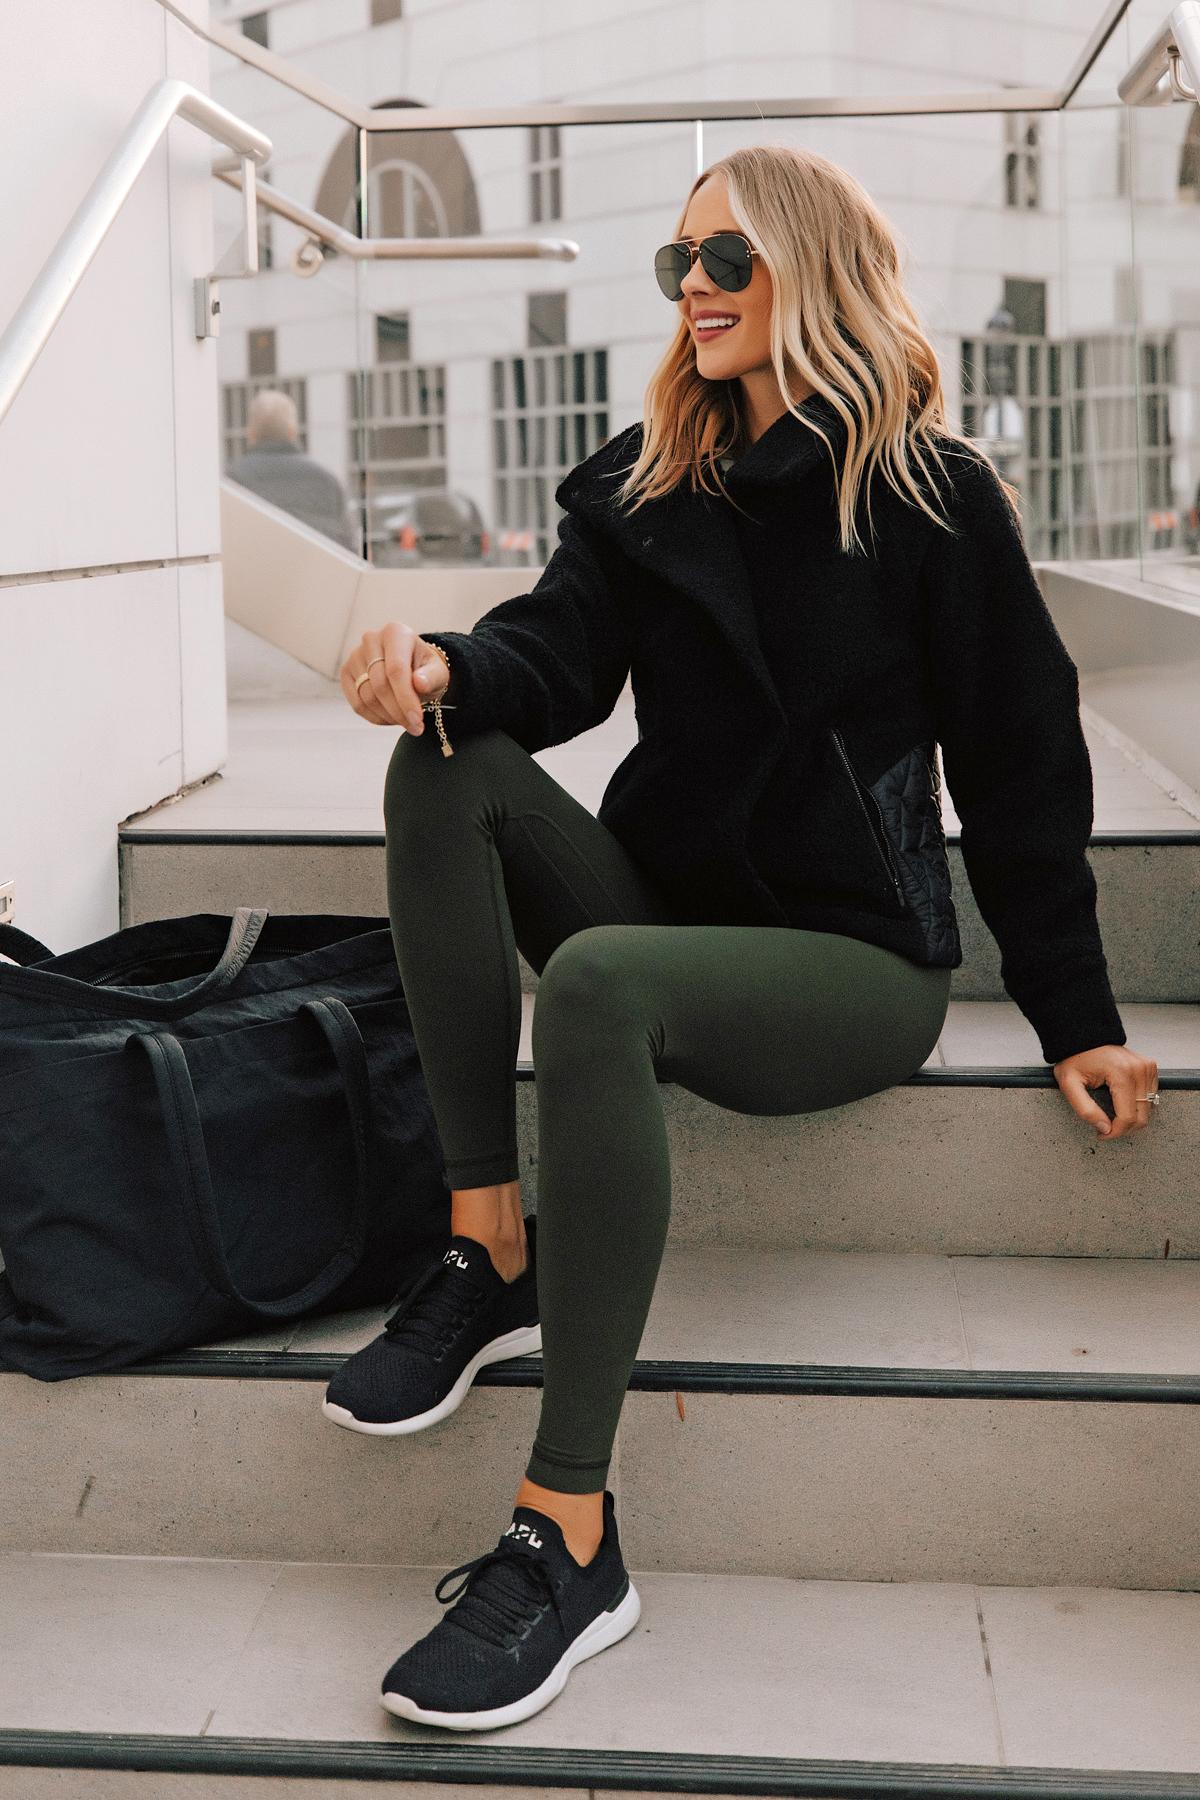 Fashion Jackson Wearing lululemon Align Leggings Dark Olive Black Sherpa Jacket Black APL Sneakers Black Tote